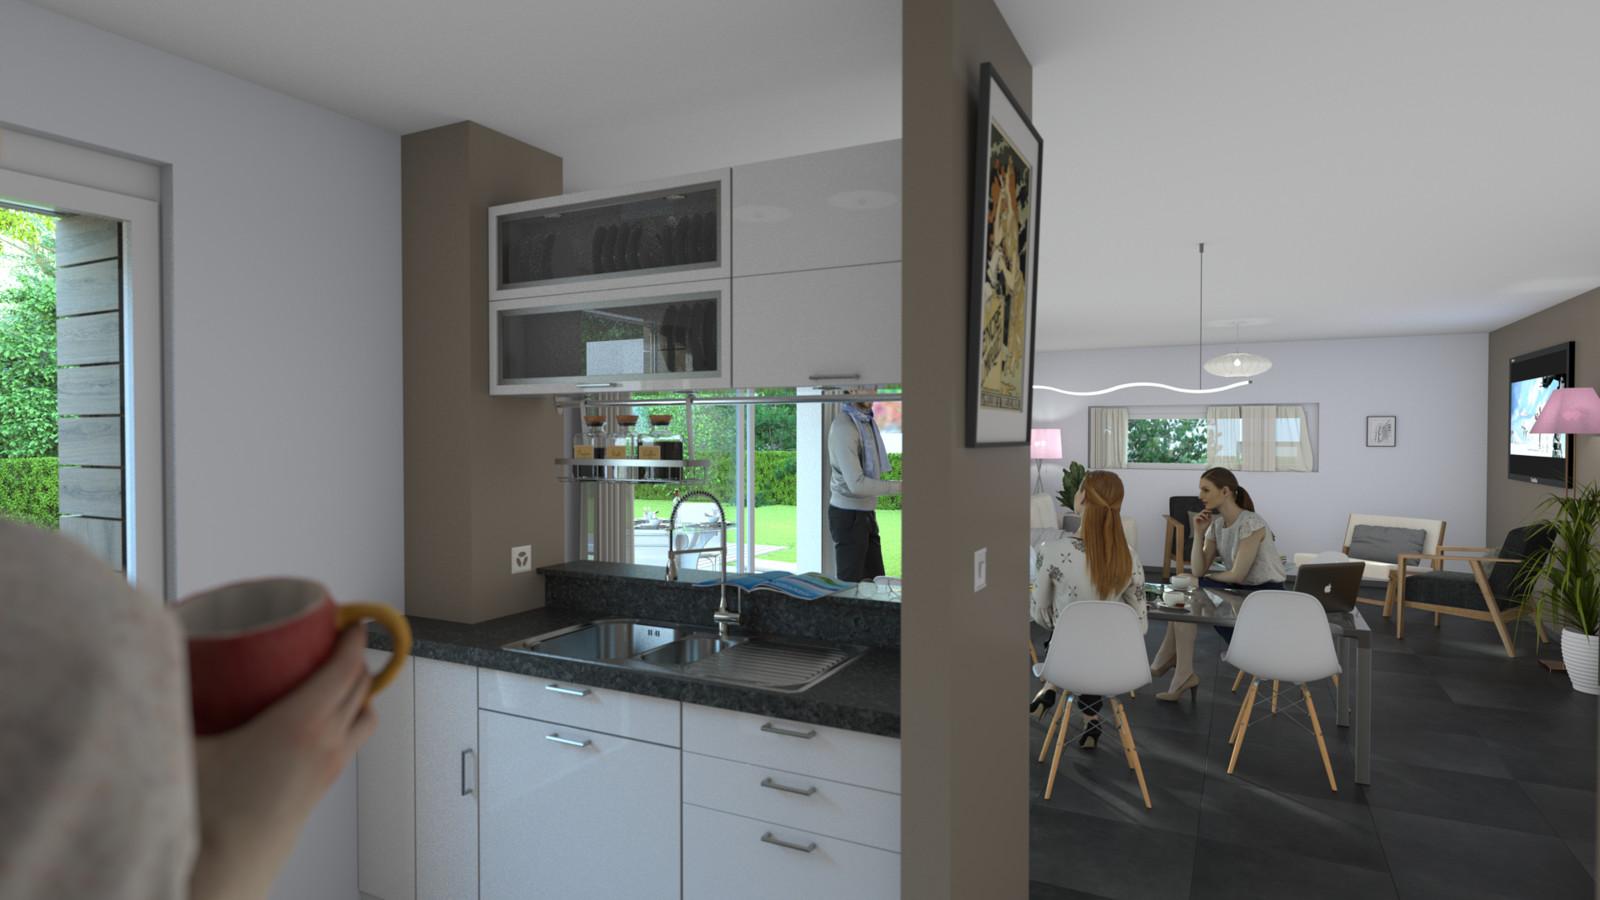 SketchUp + Thea Render  House model test 2-Scene 7 Kitchen_living Rm 2pt  Presto AO HD 1080